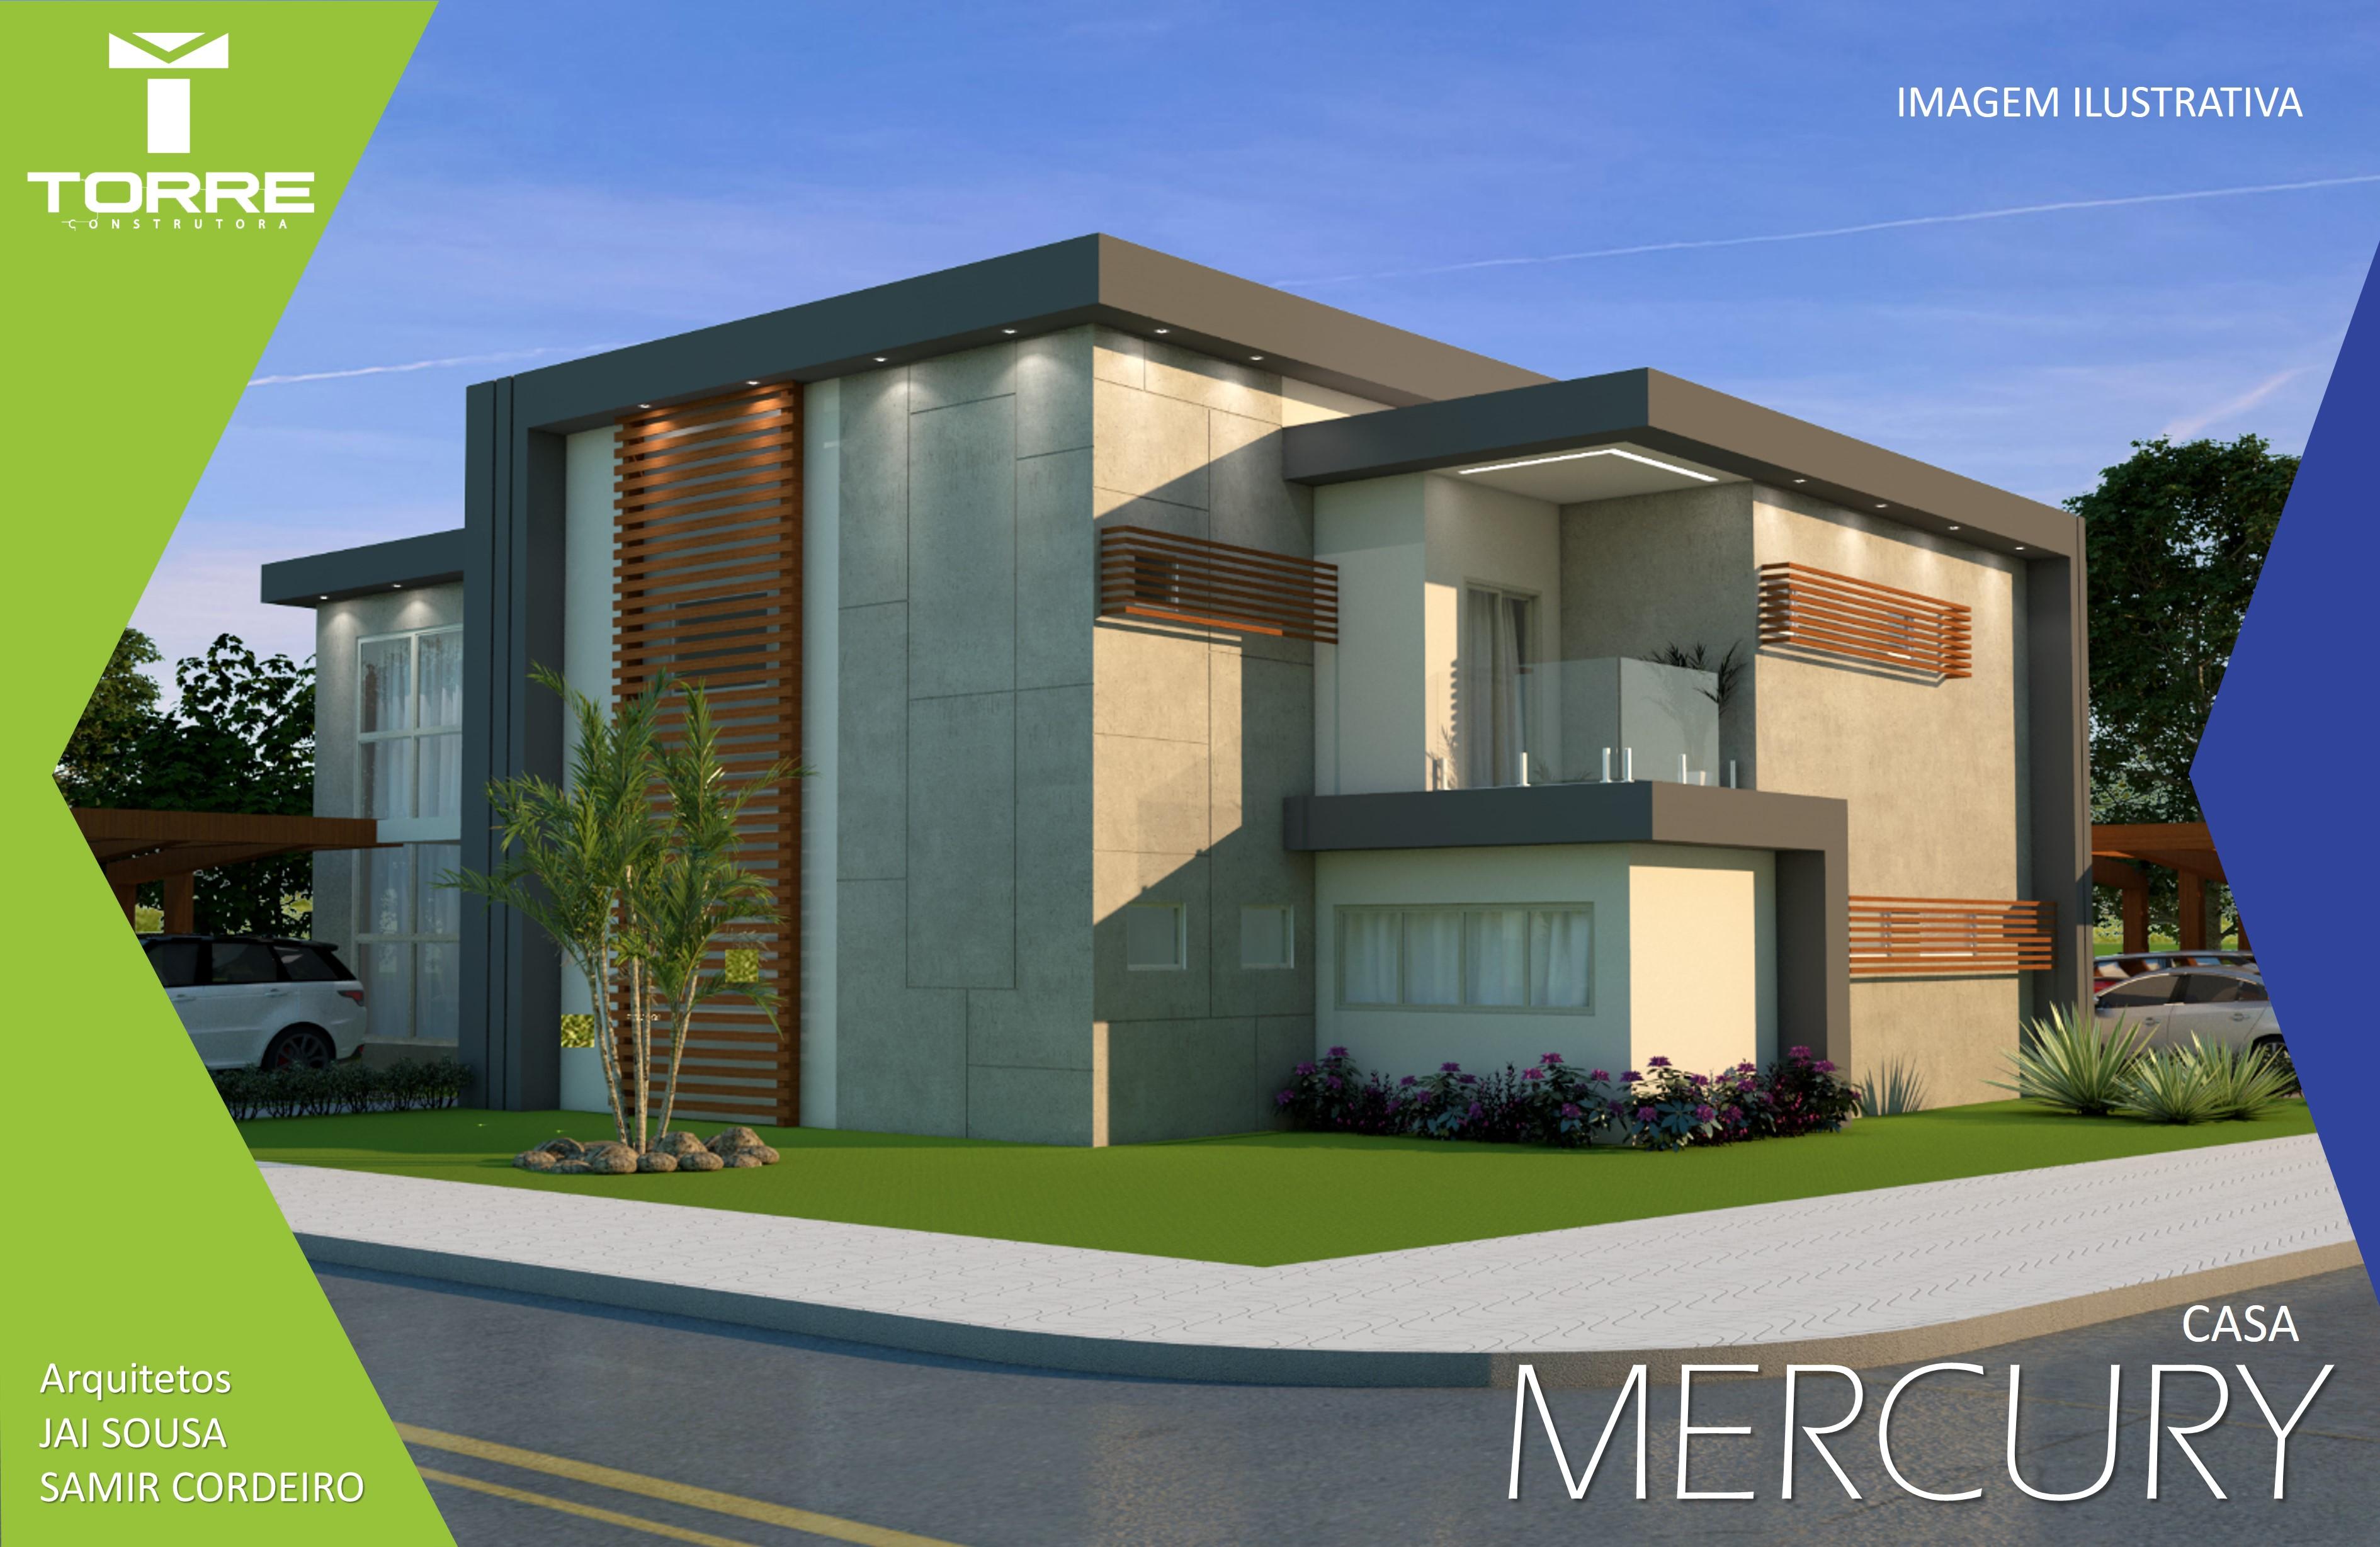 Casa Mercury